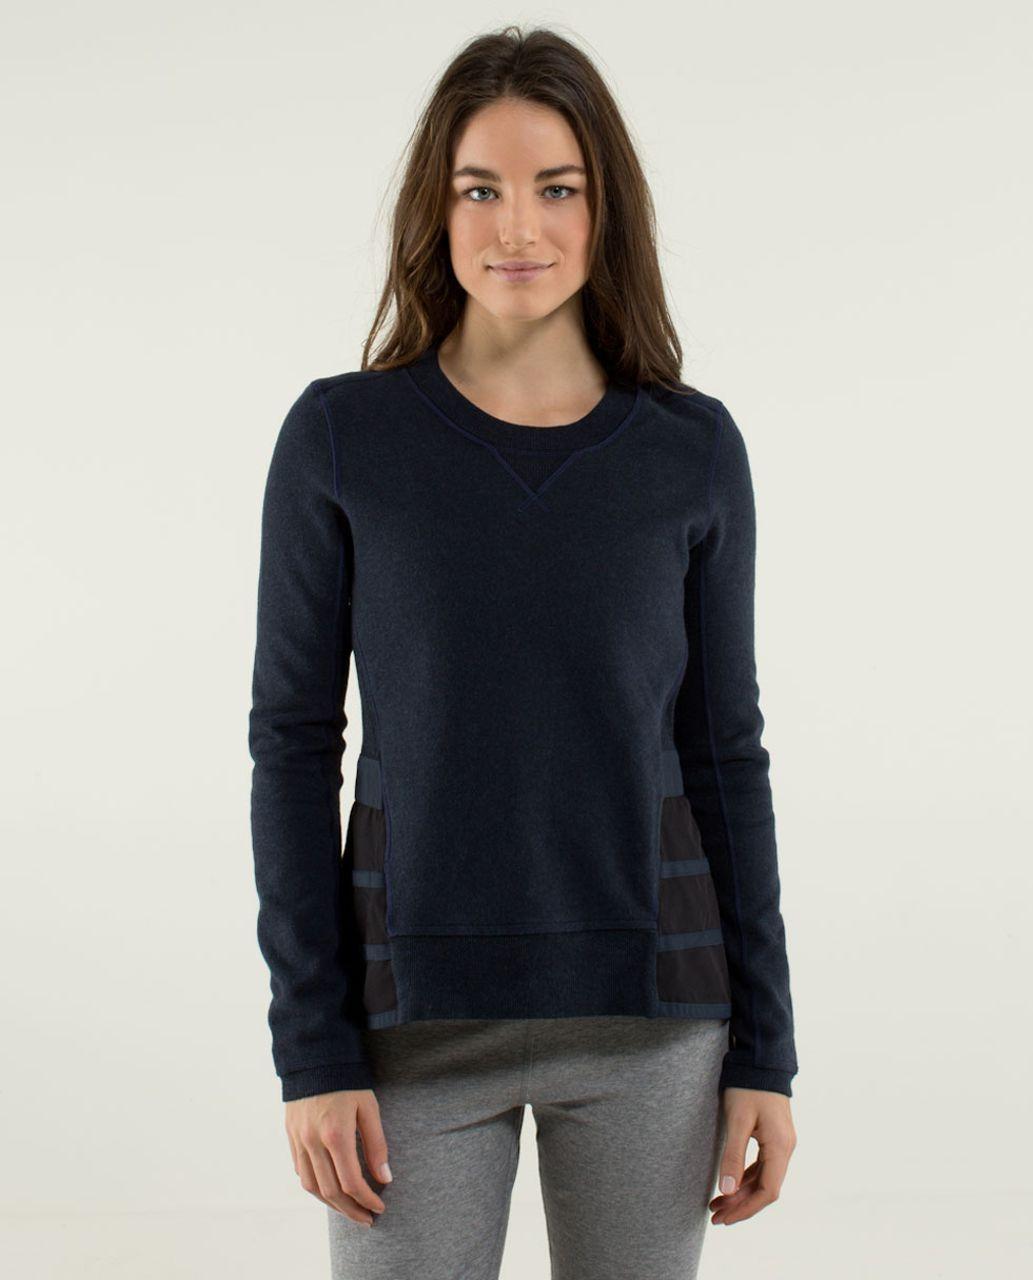 Lululemon Ruffled Up Pullover - Heathered Inkwell / Inkwell